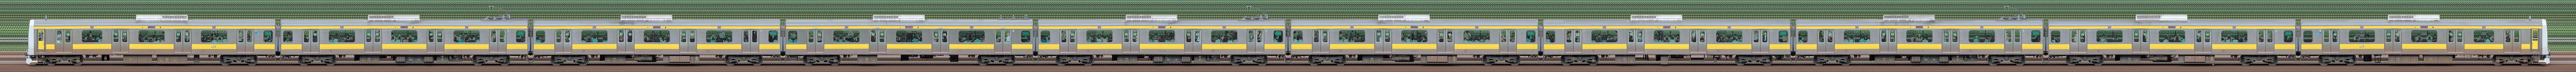 JR東日本 中央・総武緩行線 E231系500番台A540編成(線路設備モニタリング装置対応編成・山側) の編成サイドビュー